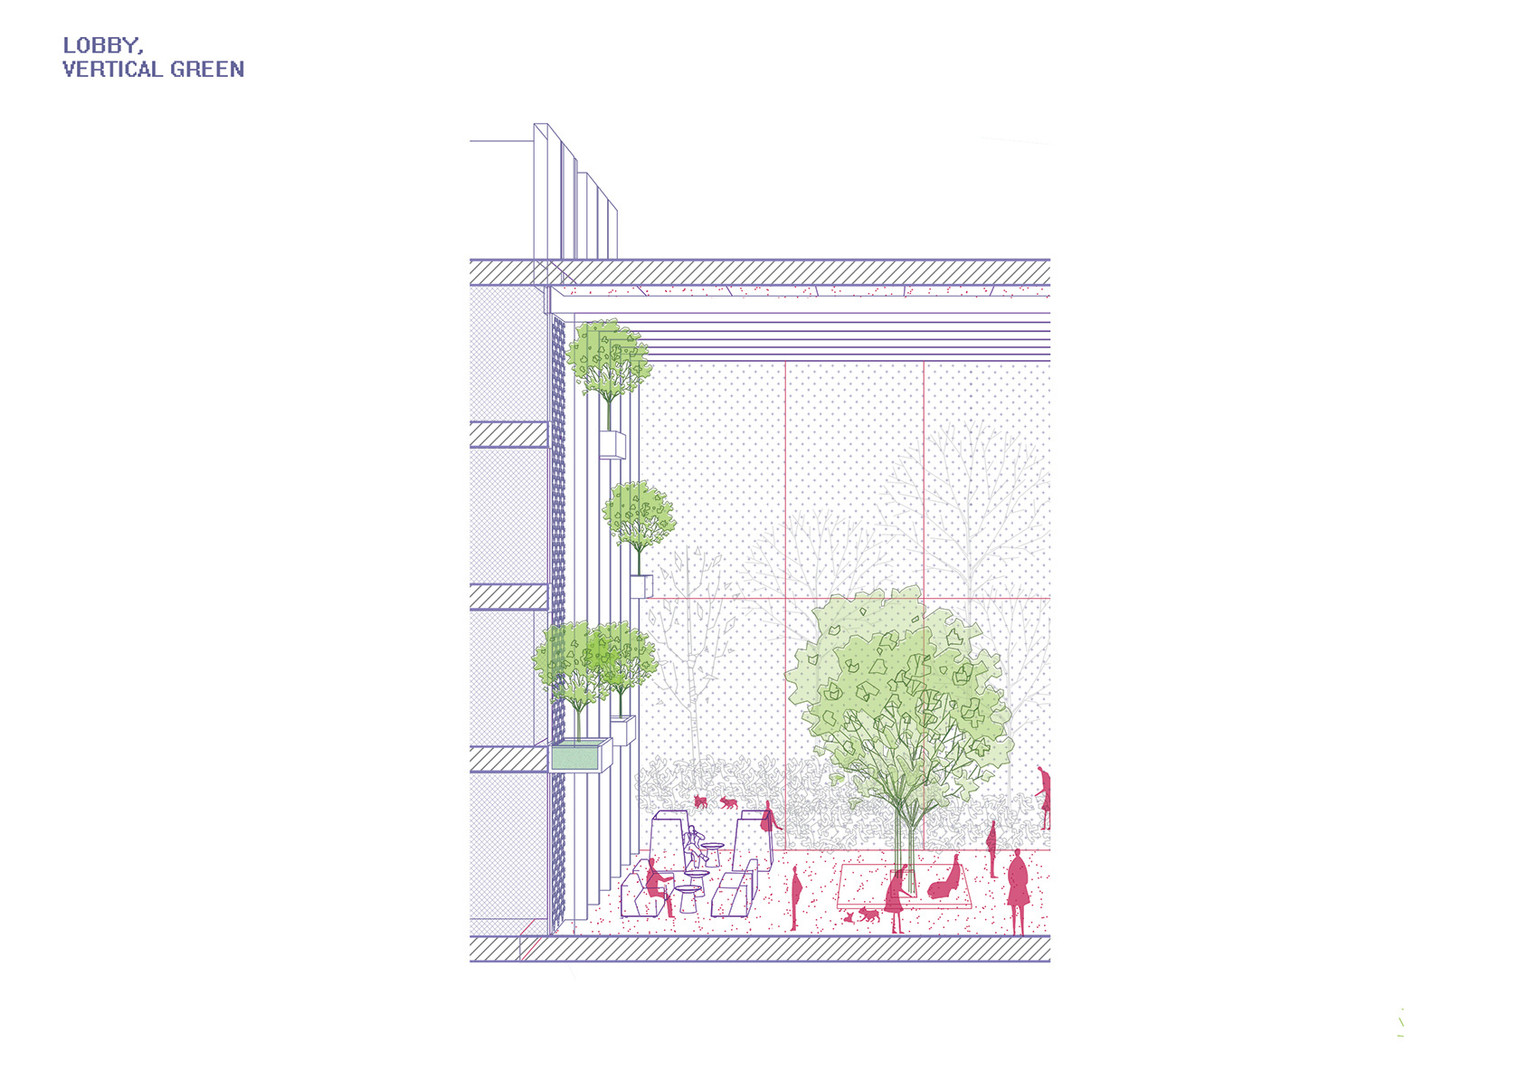 20161213_UGH_Diagram_Lobby_vertical gree